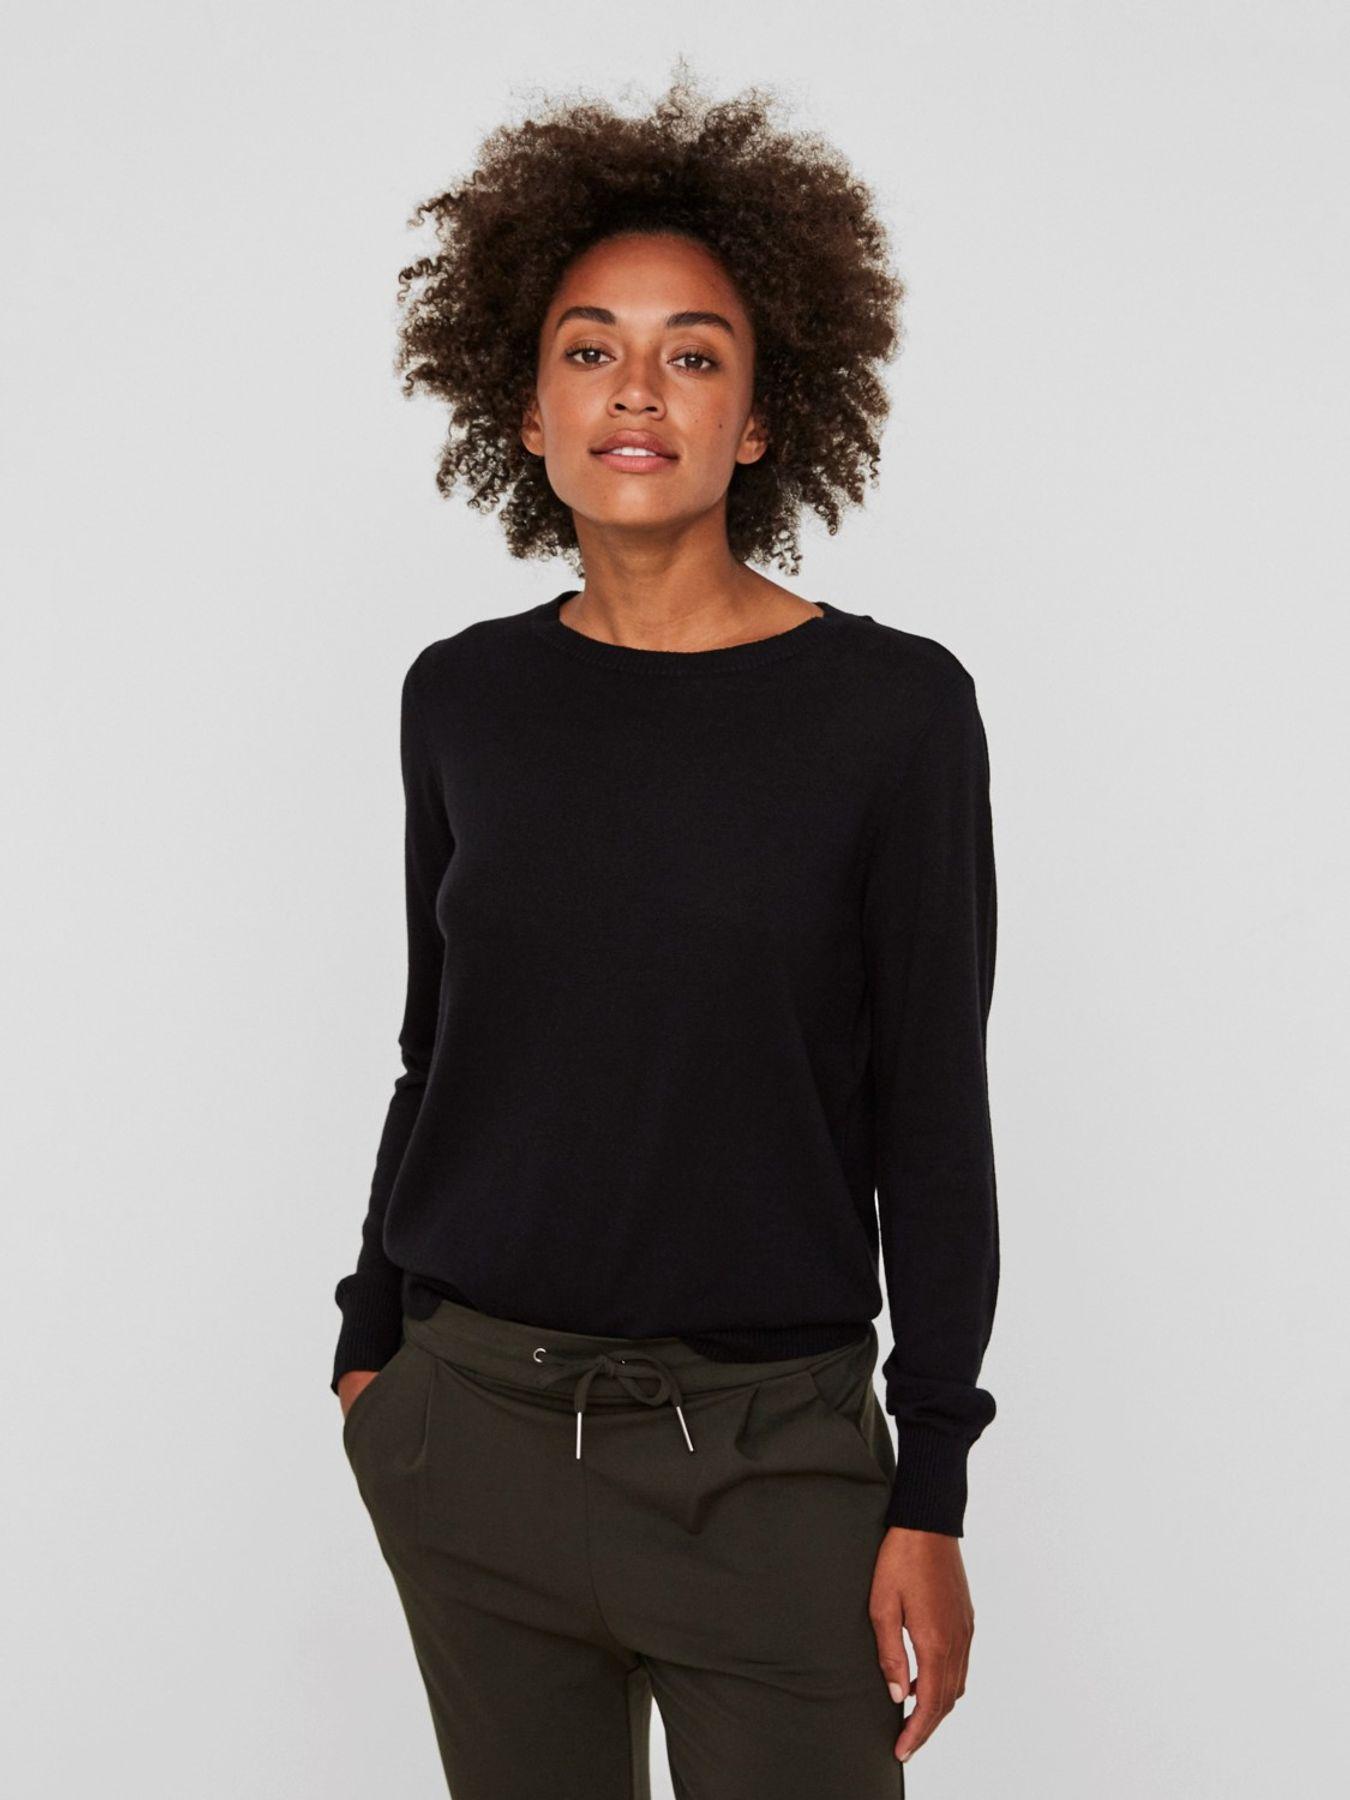 VERO MODA - Damen Pullover in Langarm in schwarz, VMMILDA LS O-NECK BLOUSE NOOS (10196906) – Bild 3